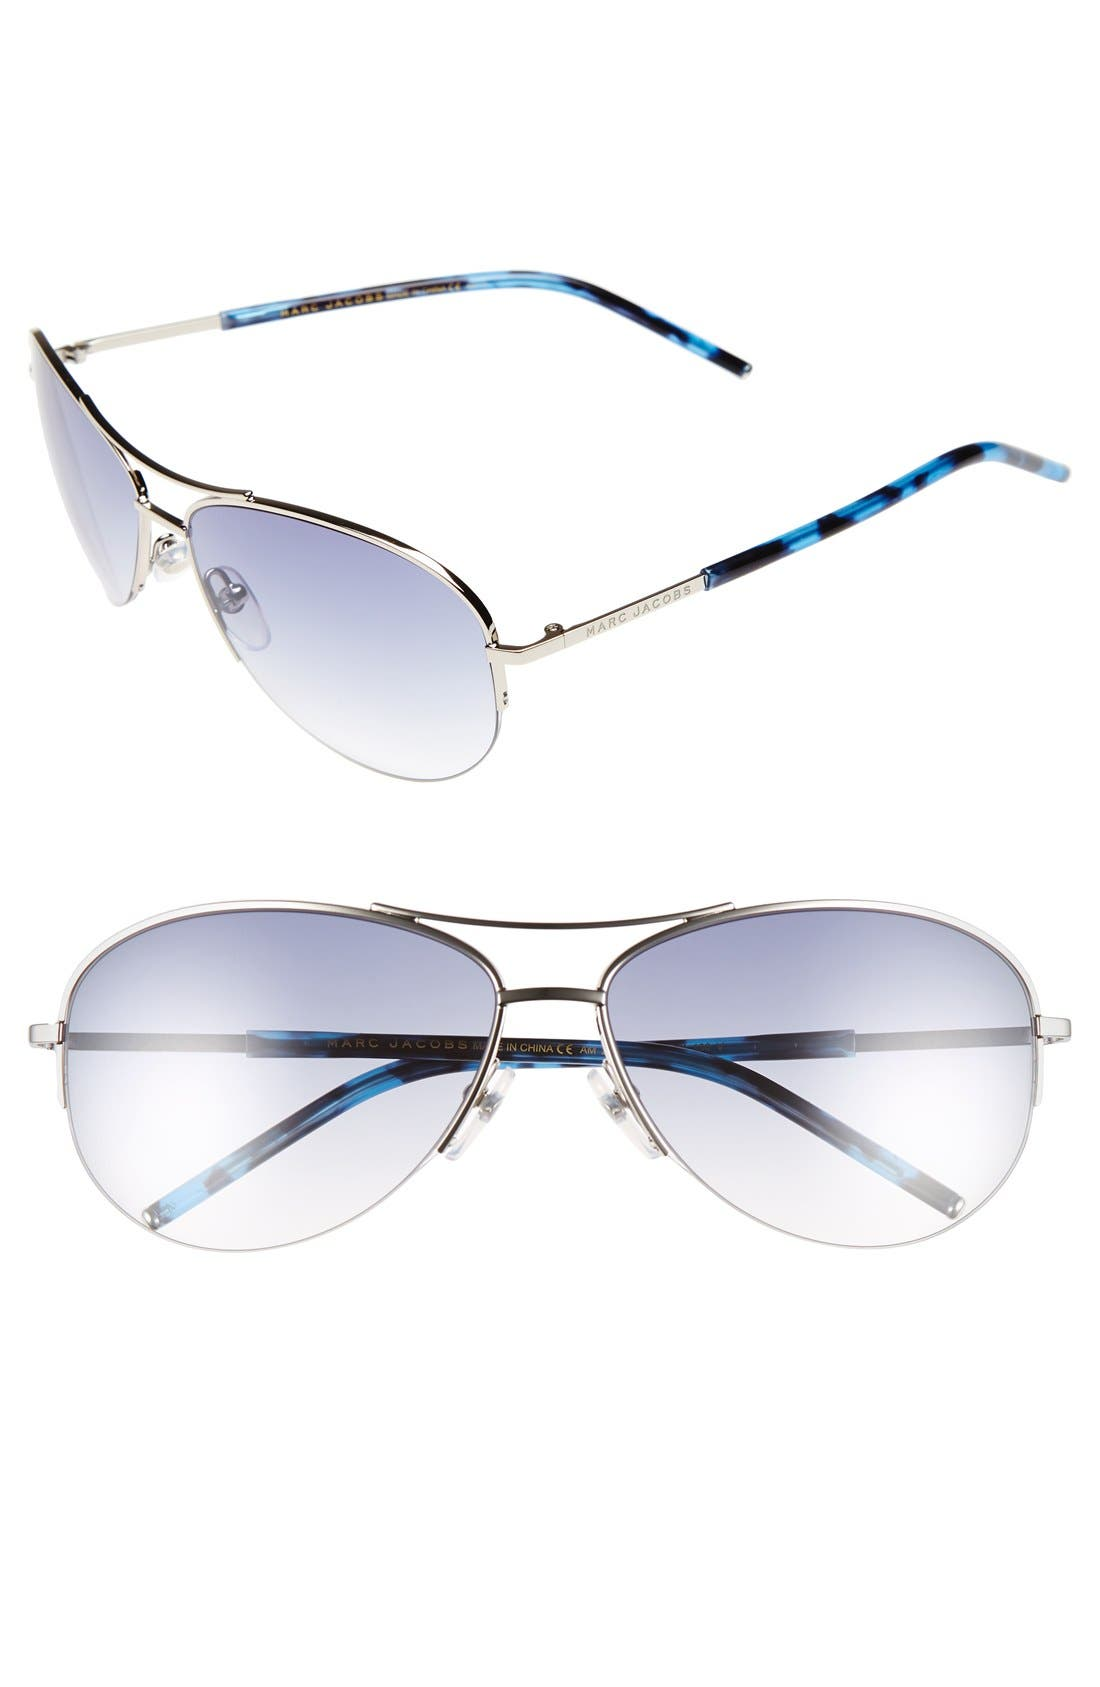 59mm Semi Rimless Sunglasses,                             Main thumbnail 1, color,                             PALLADIUM